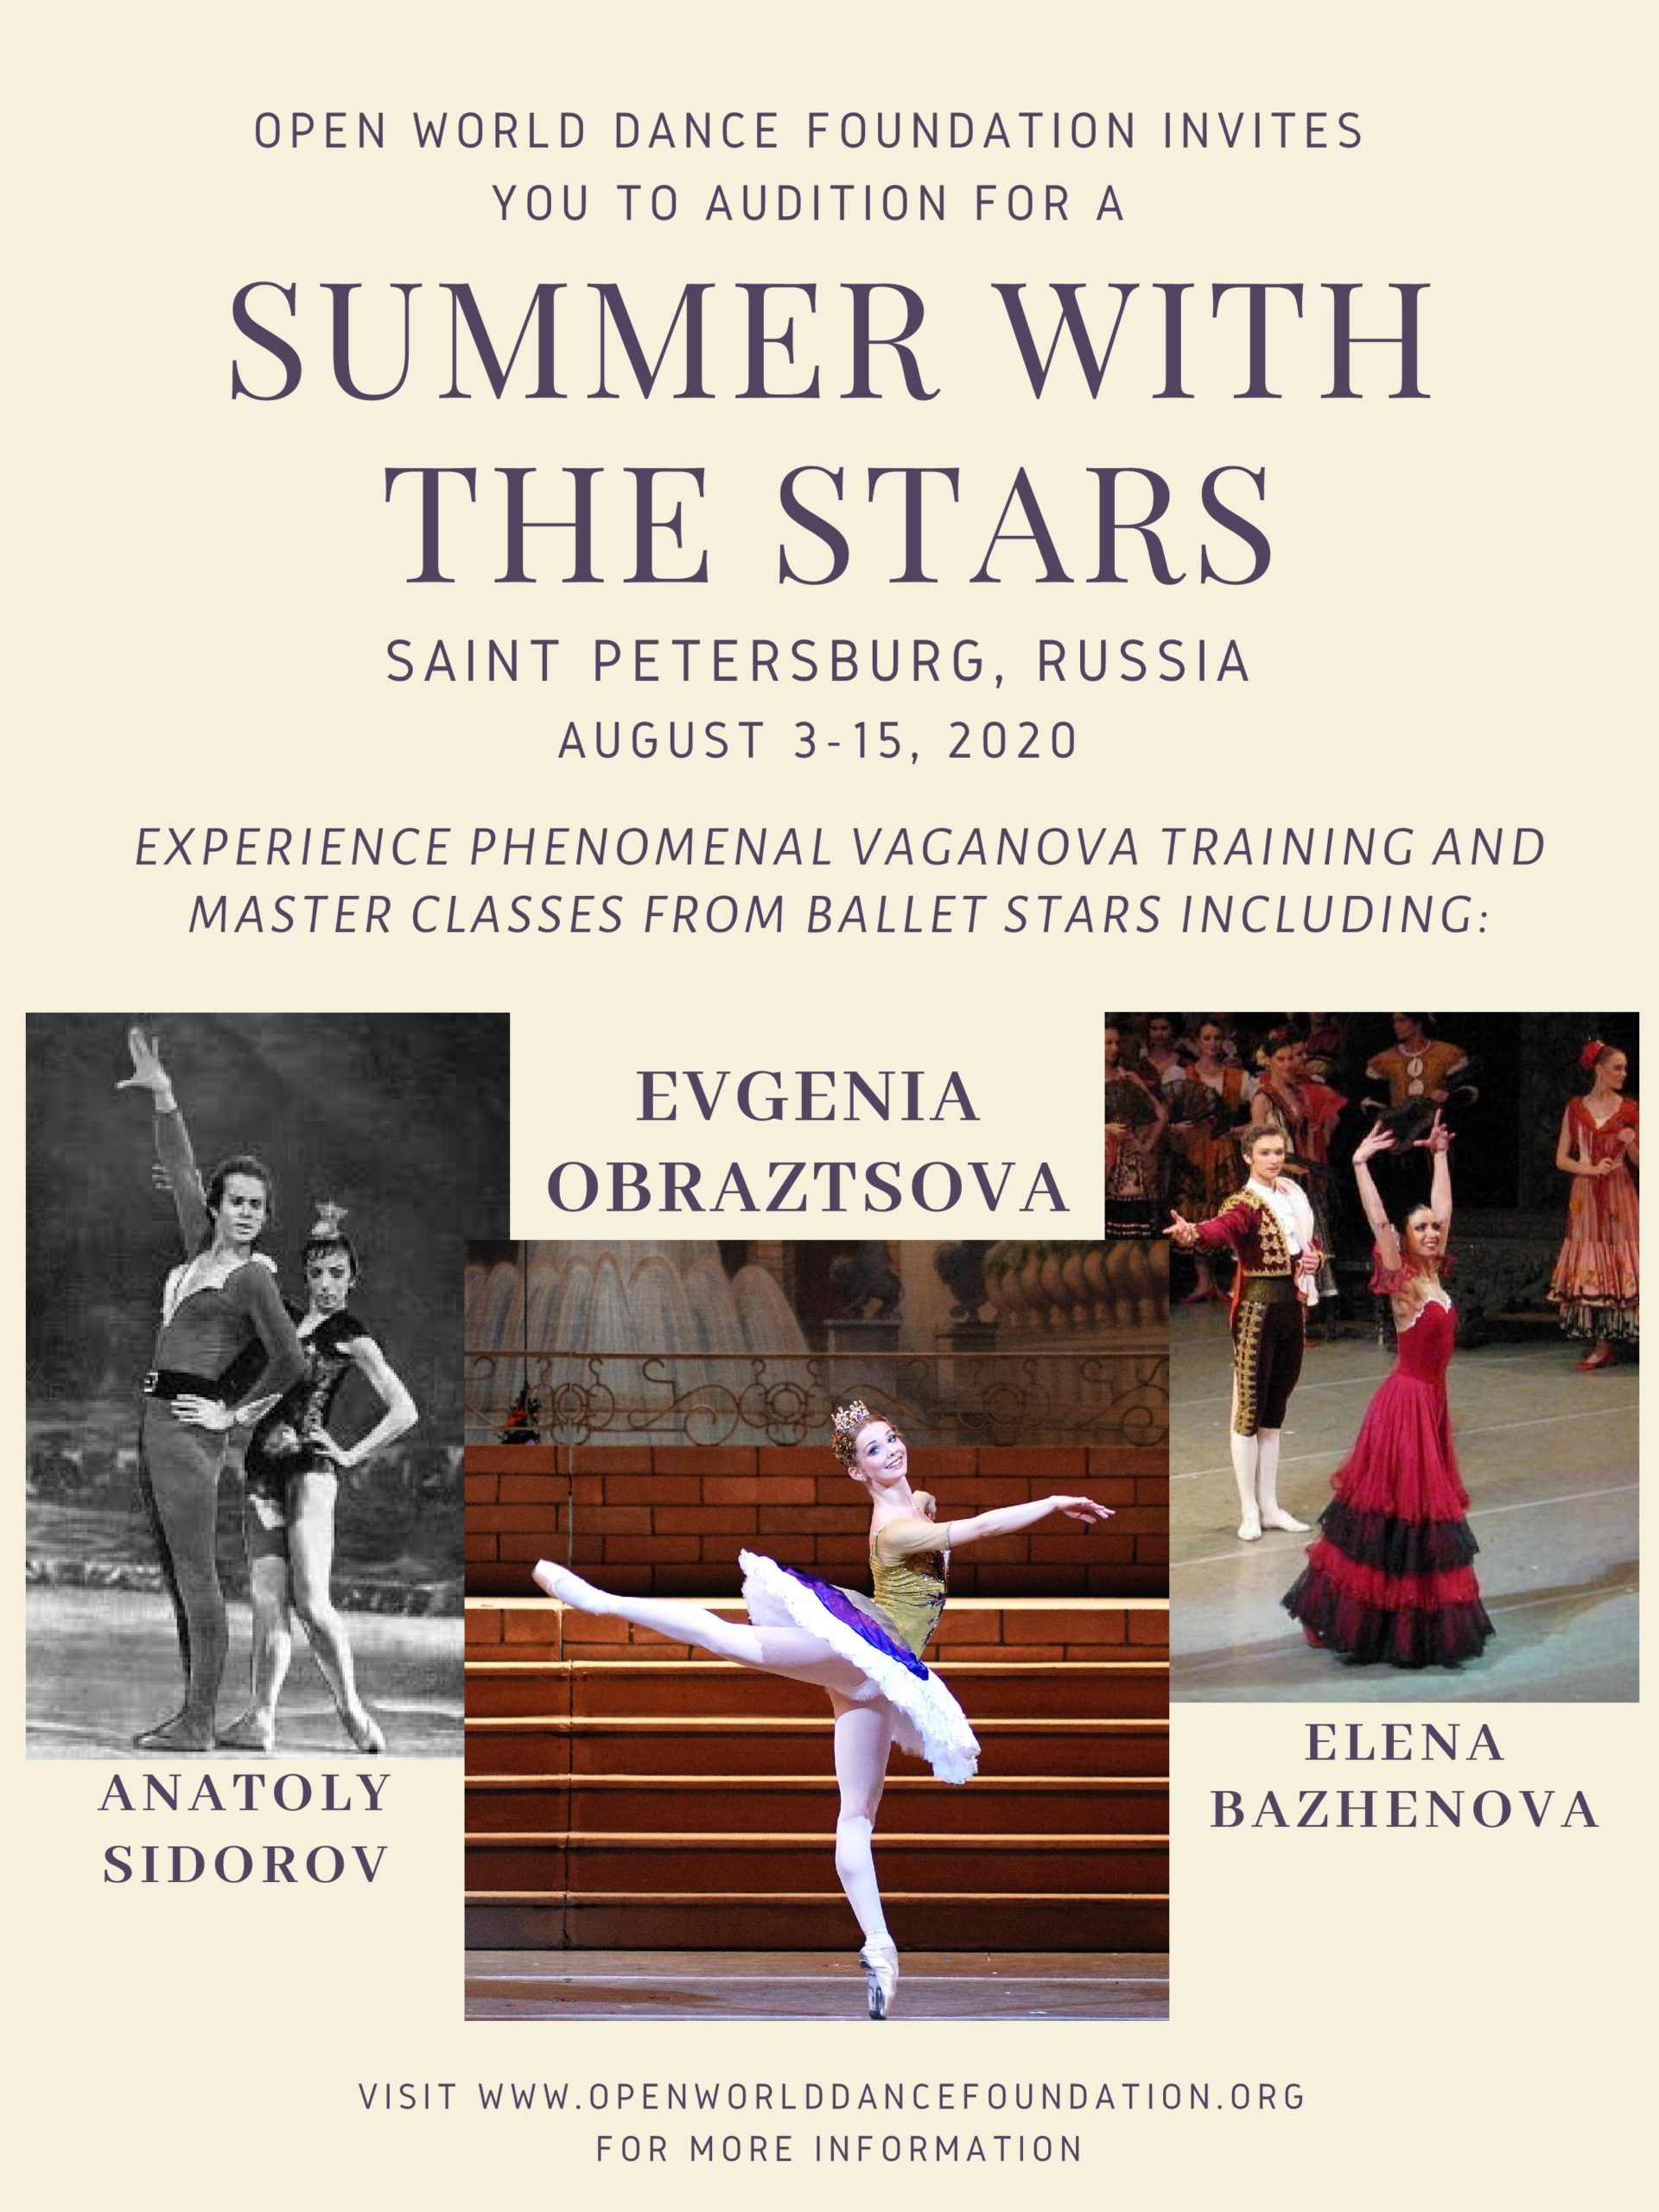 Train with stars like Evgenia Obraztsova and more!